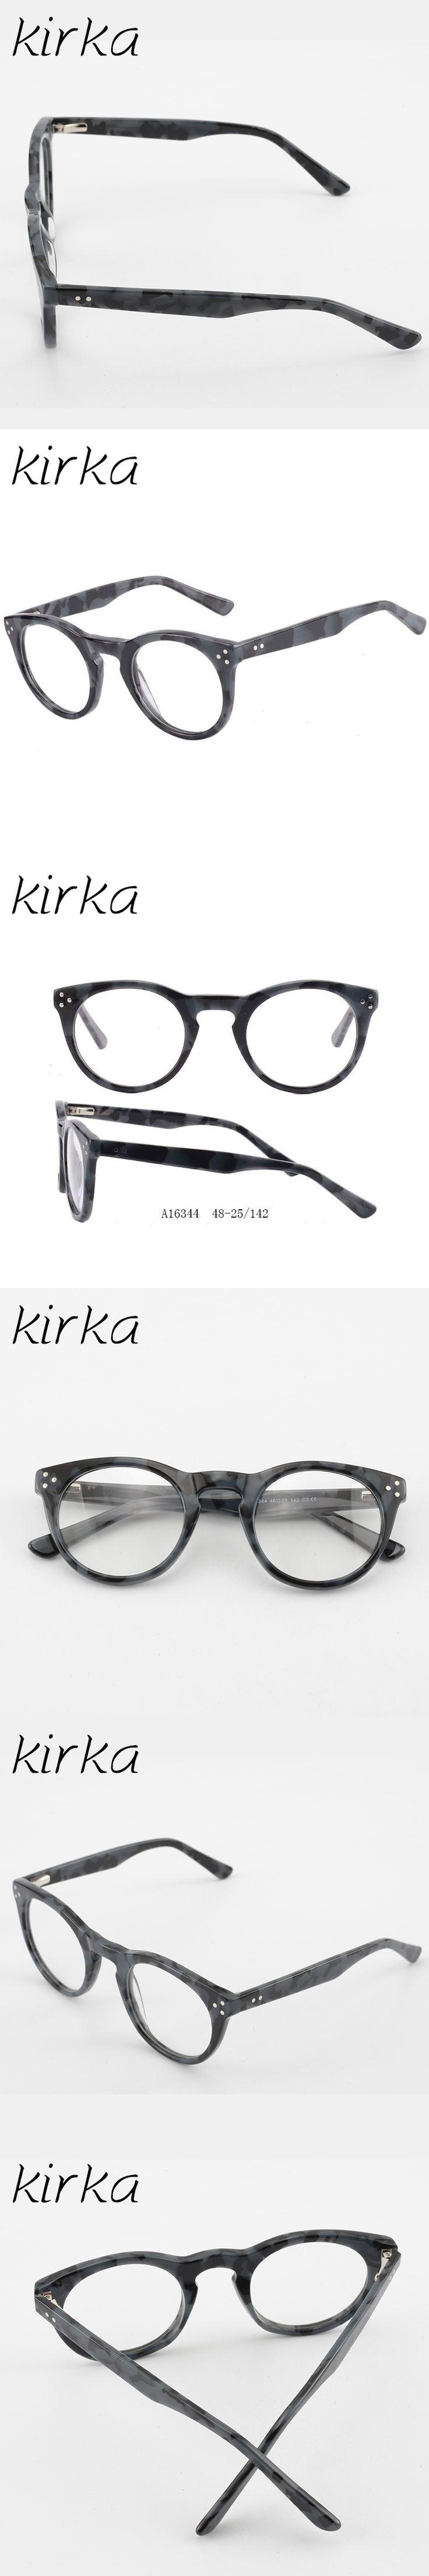 Kirka 2017 Fashion Round Cute type with Rivet Women Men Clear Computer Optical Glasses Frame Prescription Eyewear Lunette De Vue